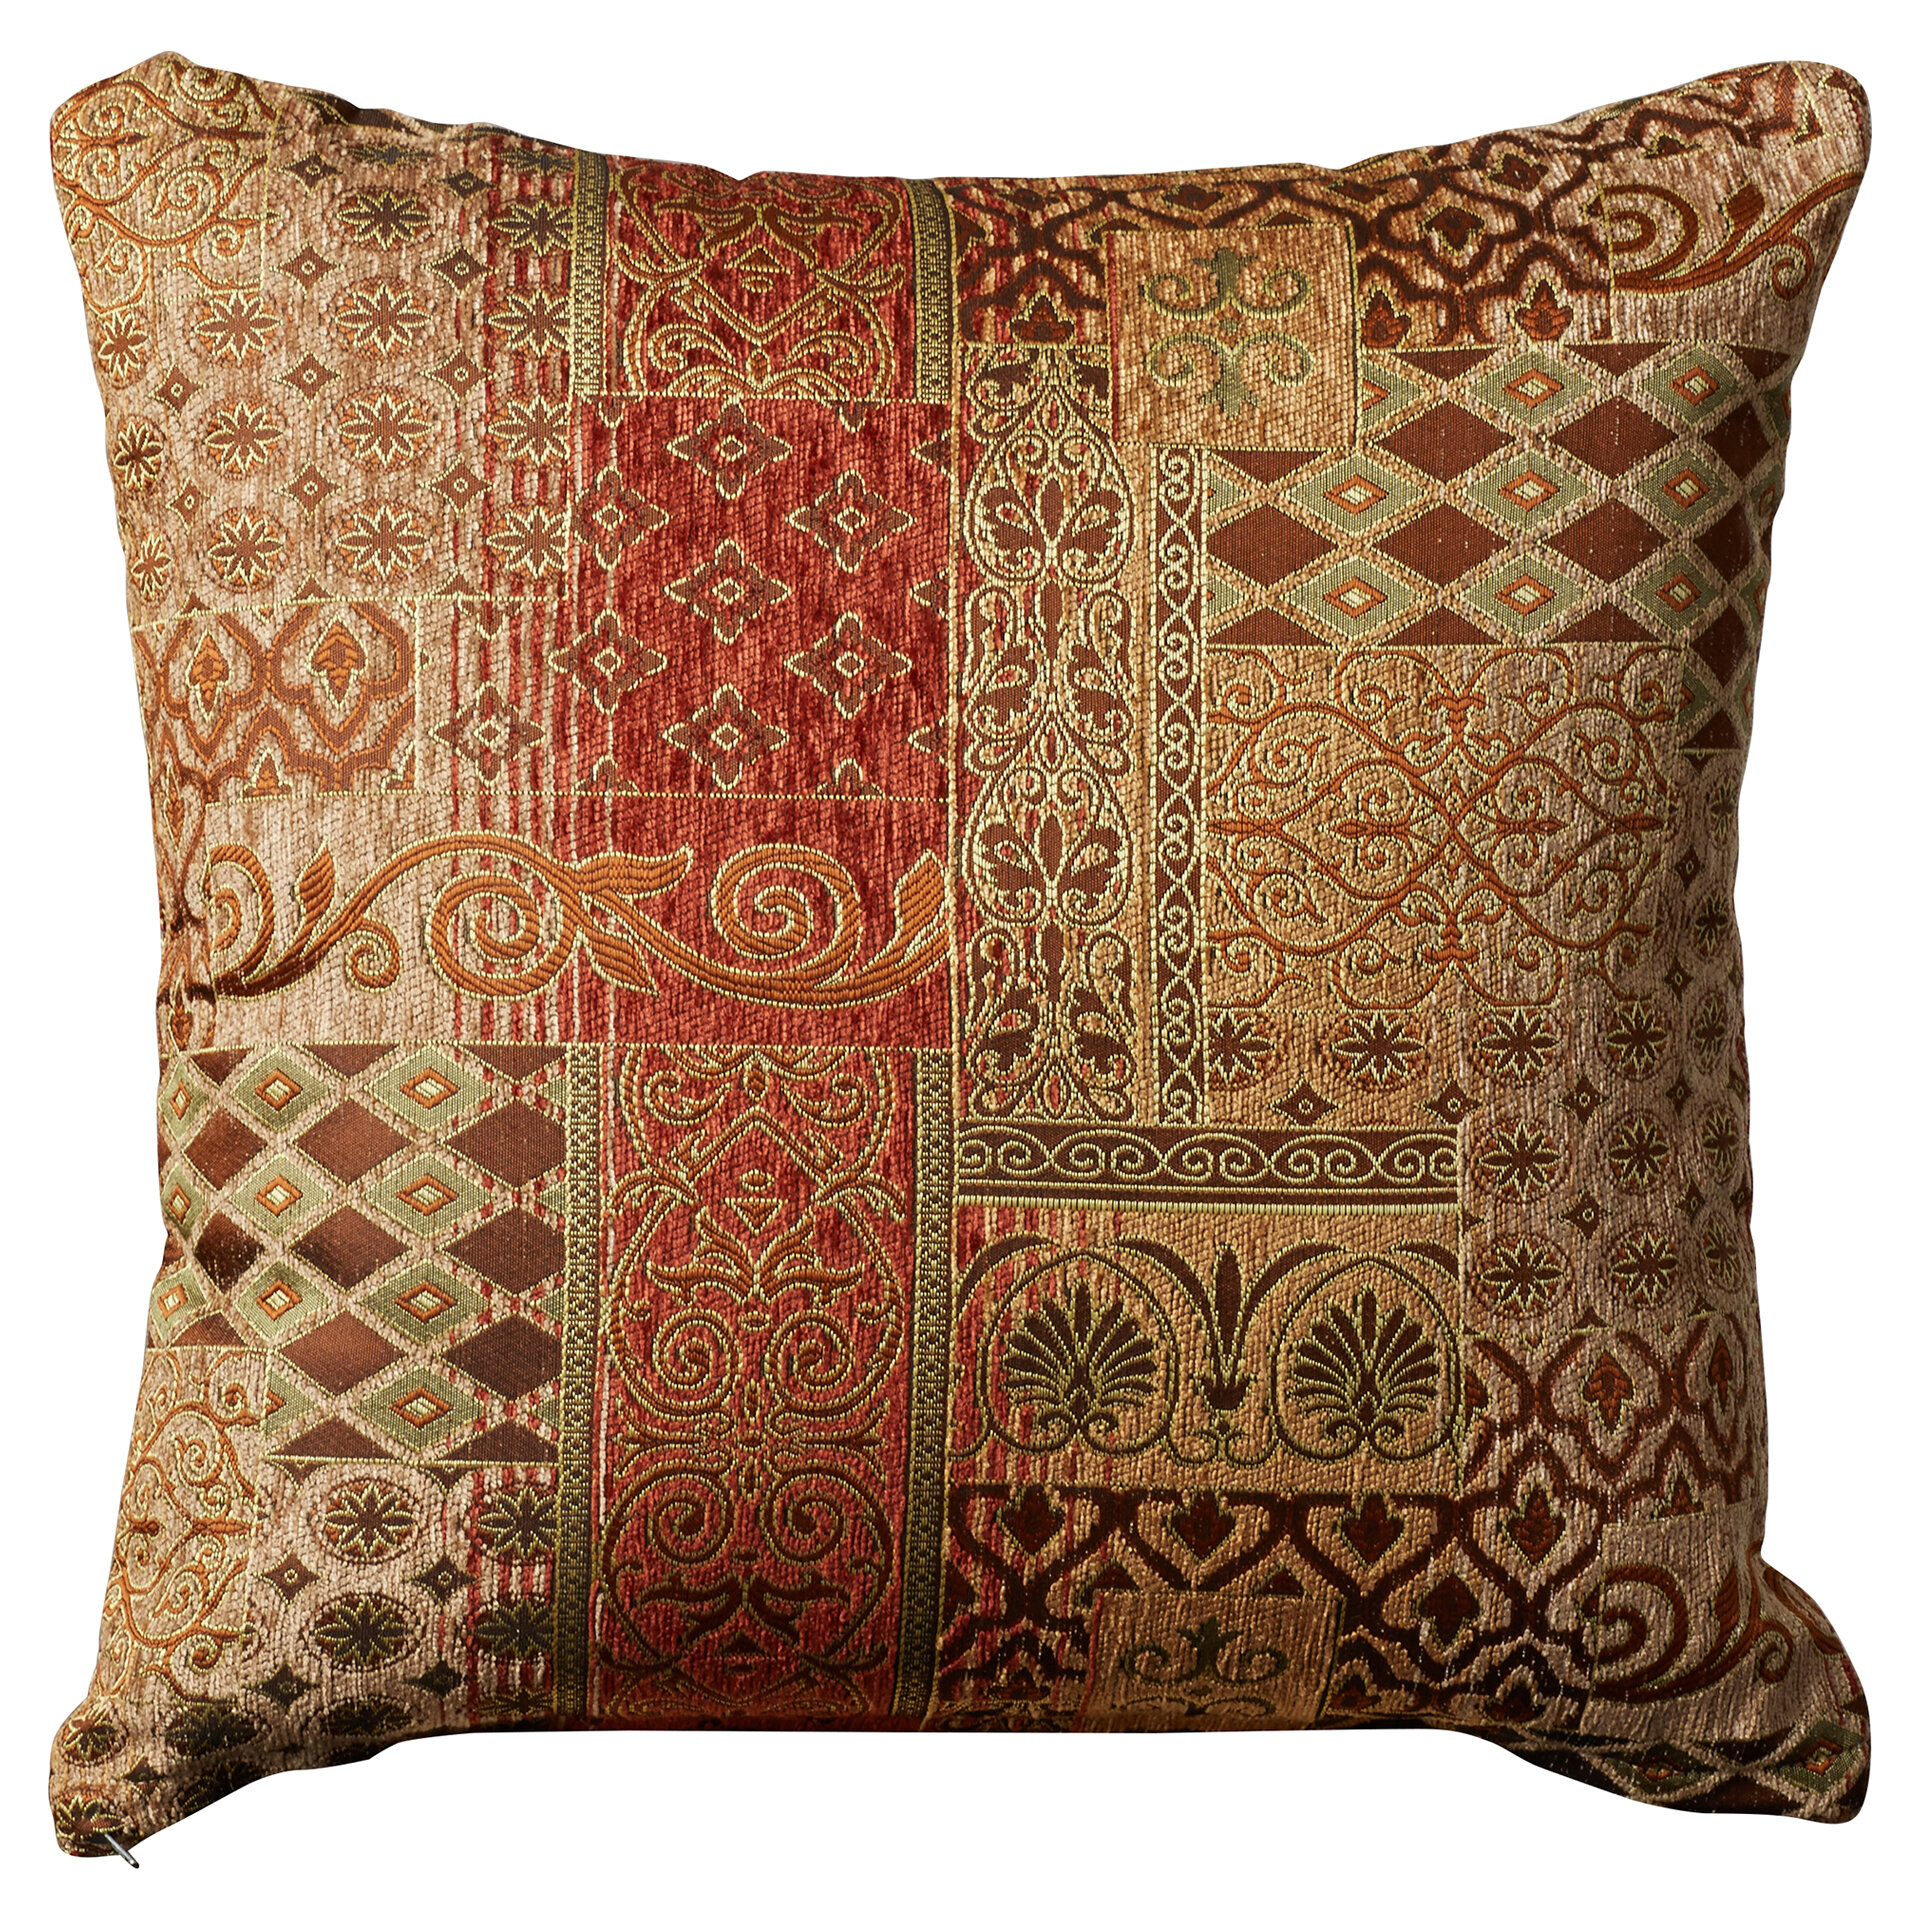 The Pillow Collection Tait Floral Bedding Sham Rain Standard//20 x 26